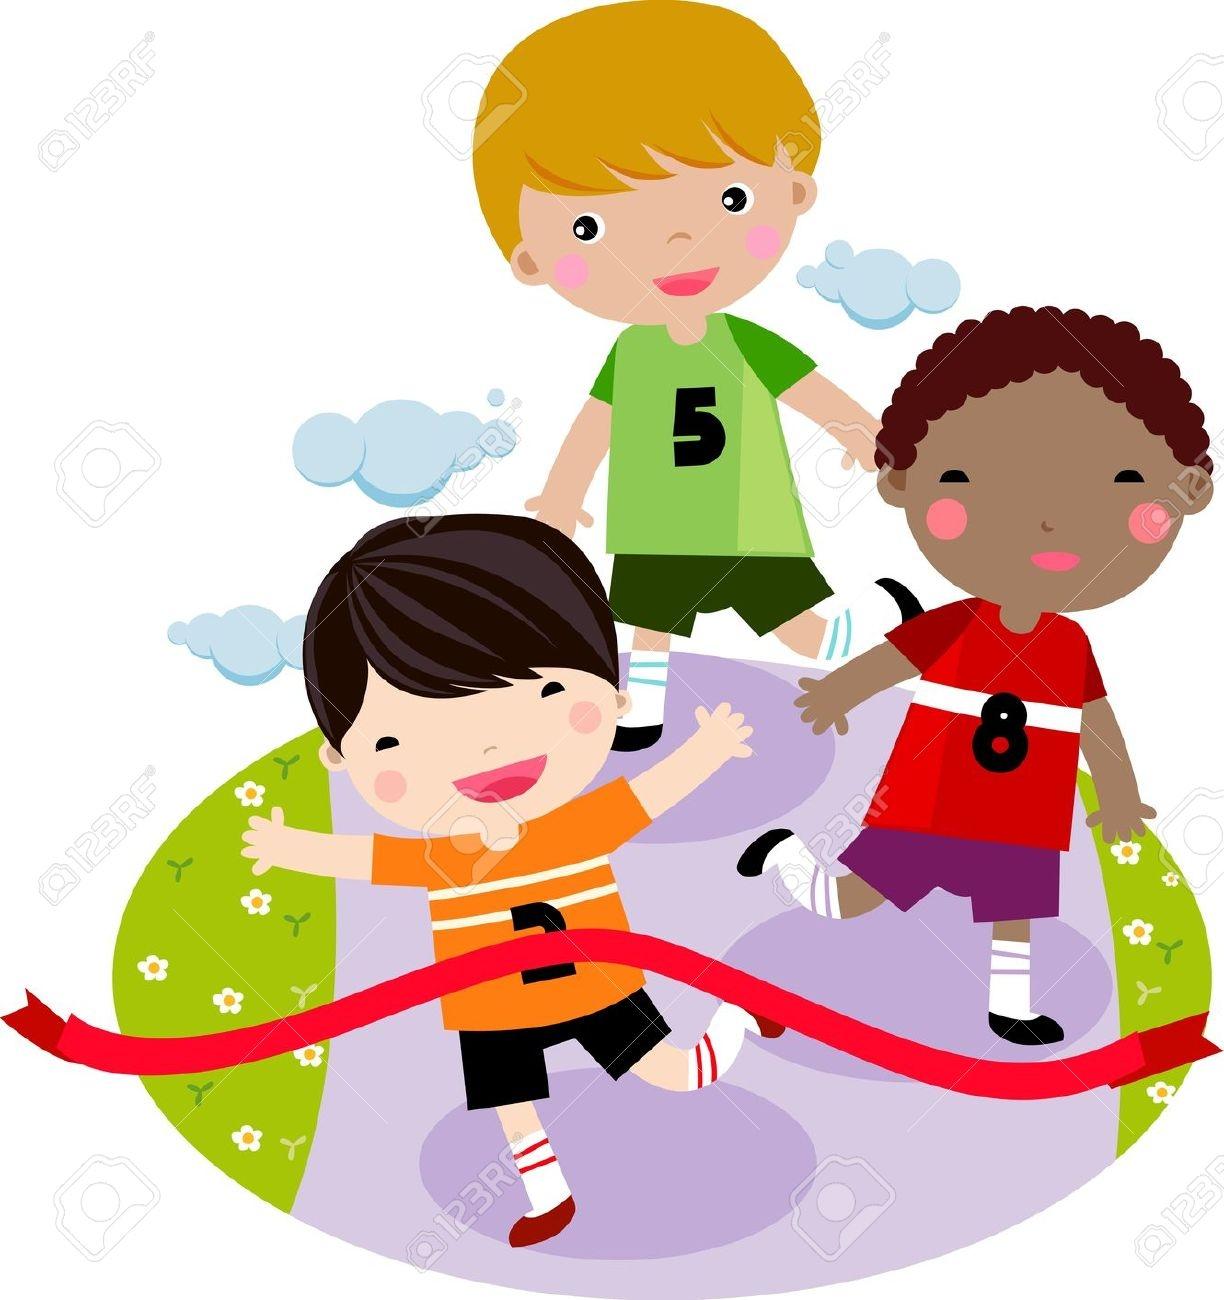 Kids Race Clipart.